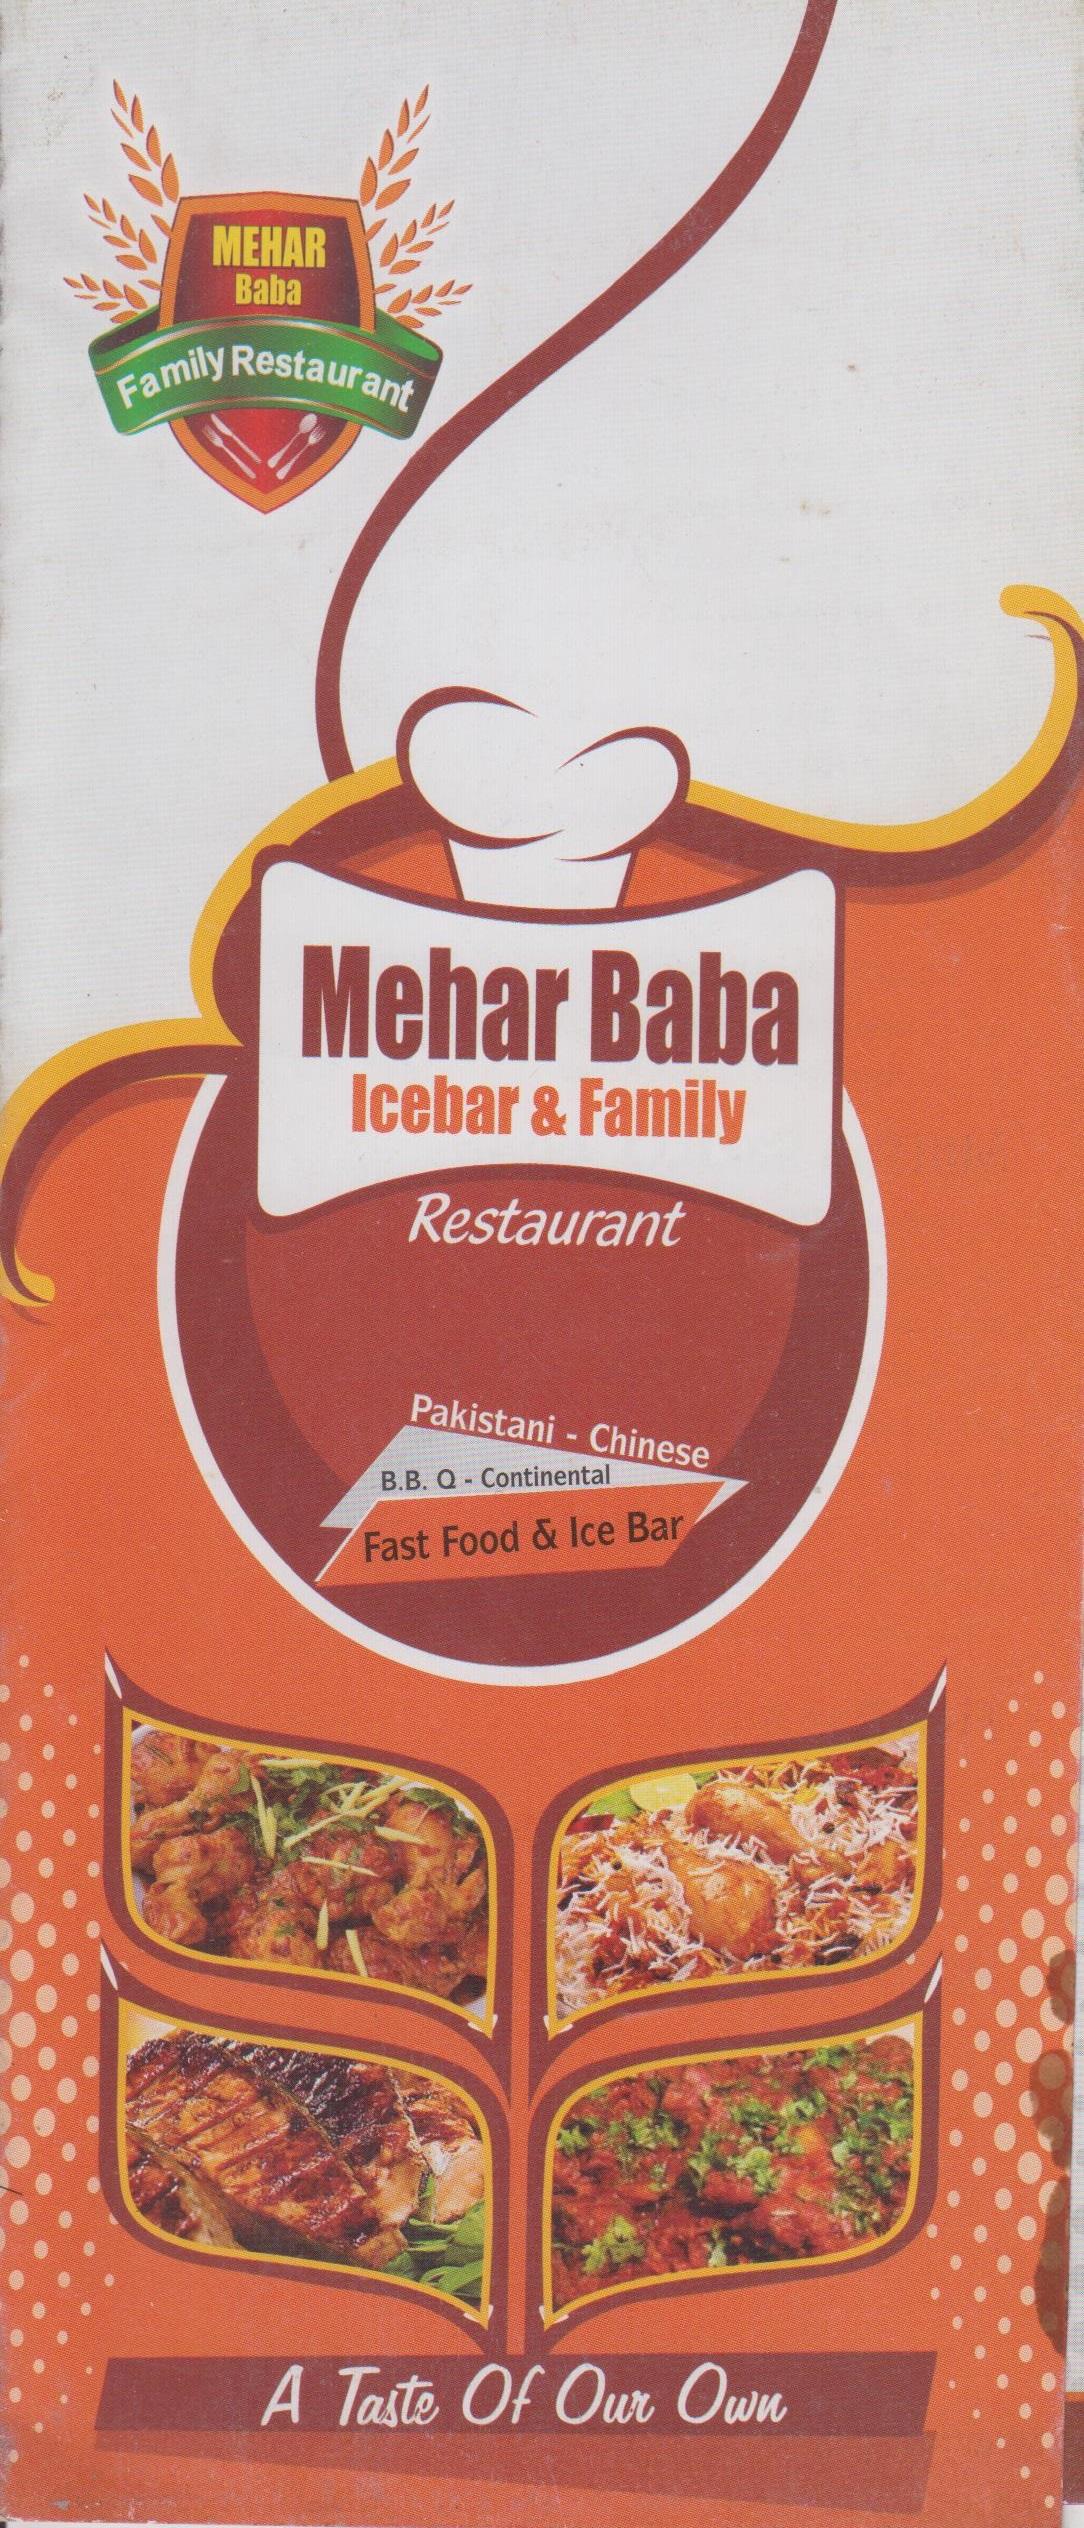 Mehar Baba Restaurant Menu